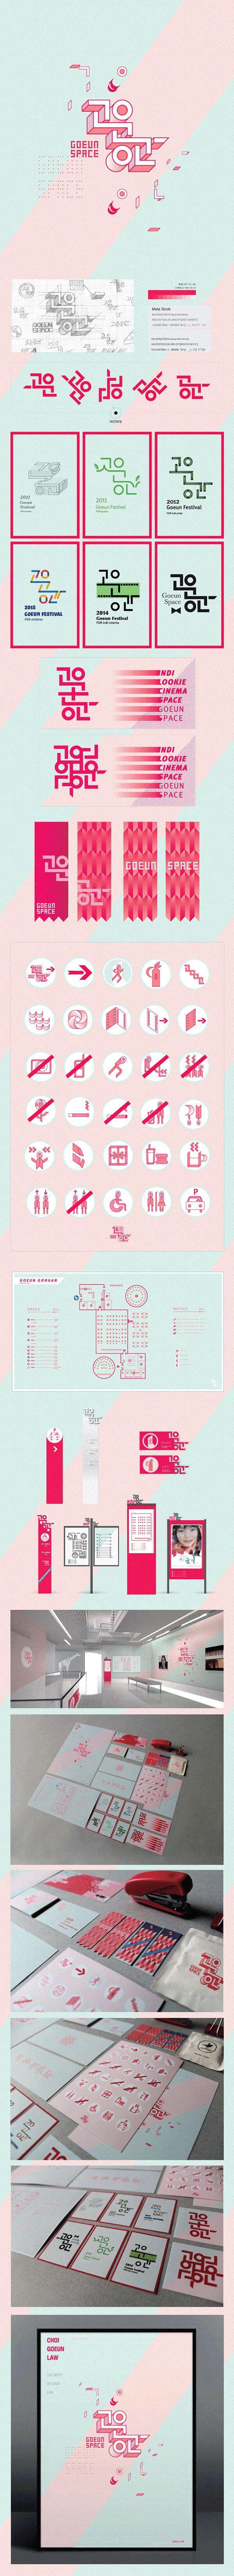 Goeun Space on Behance